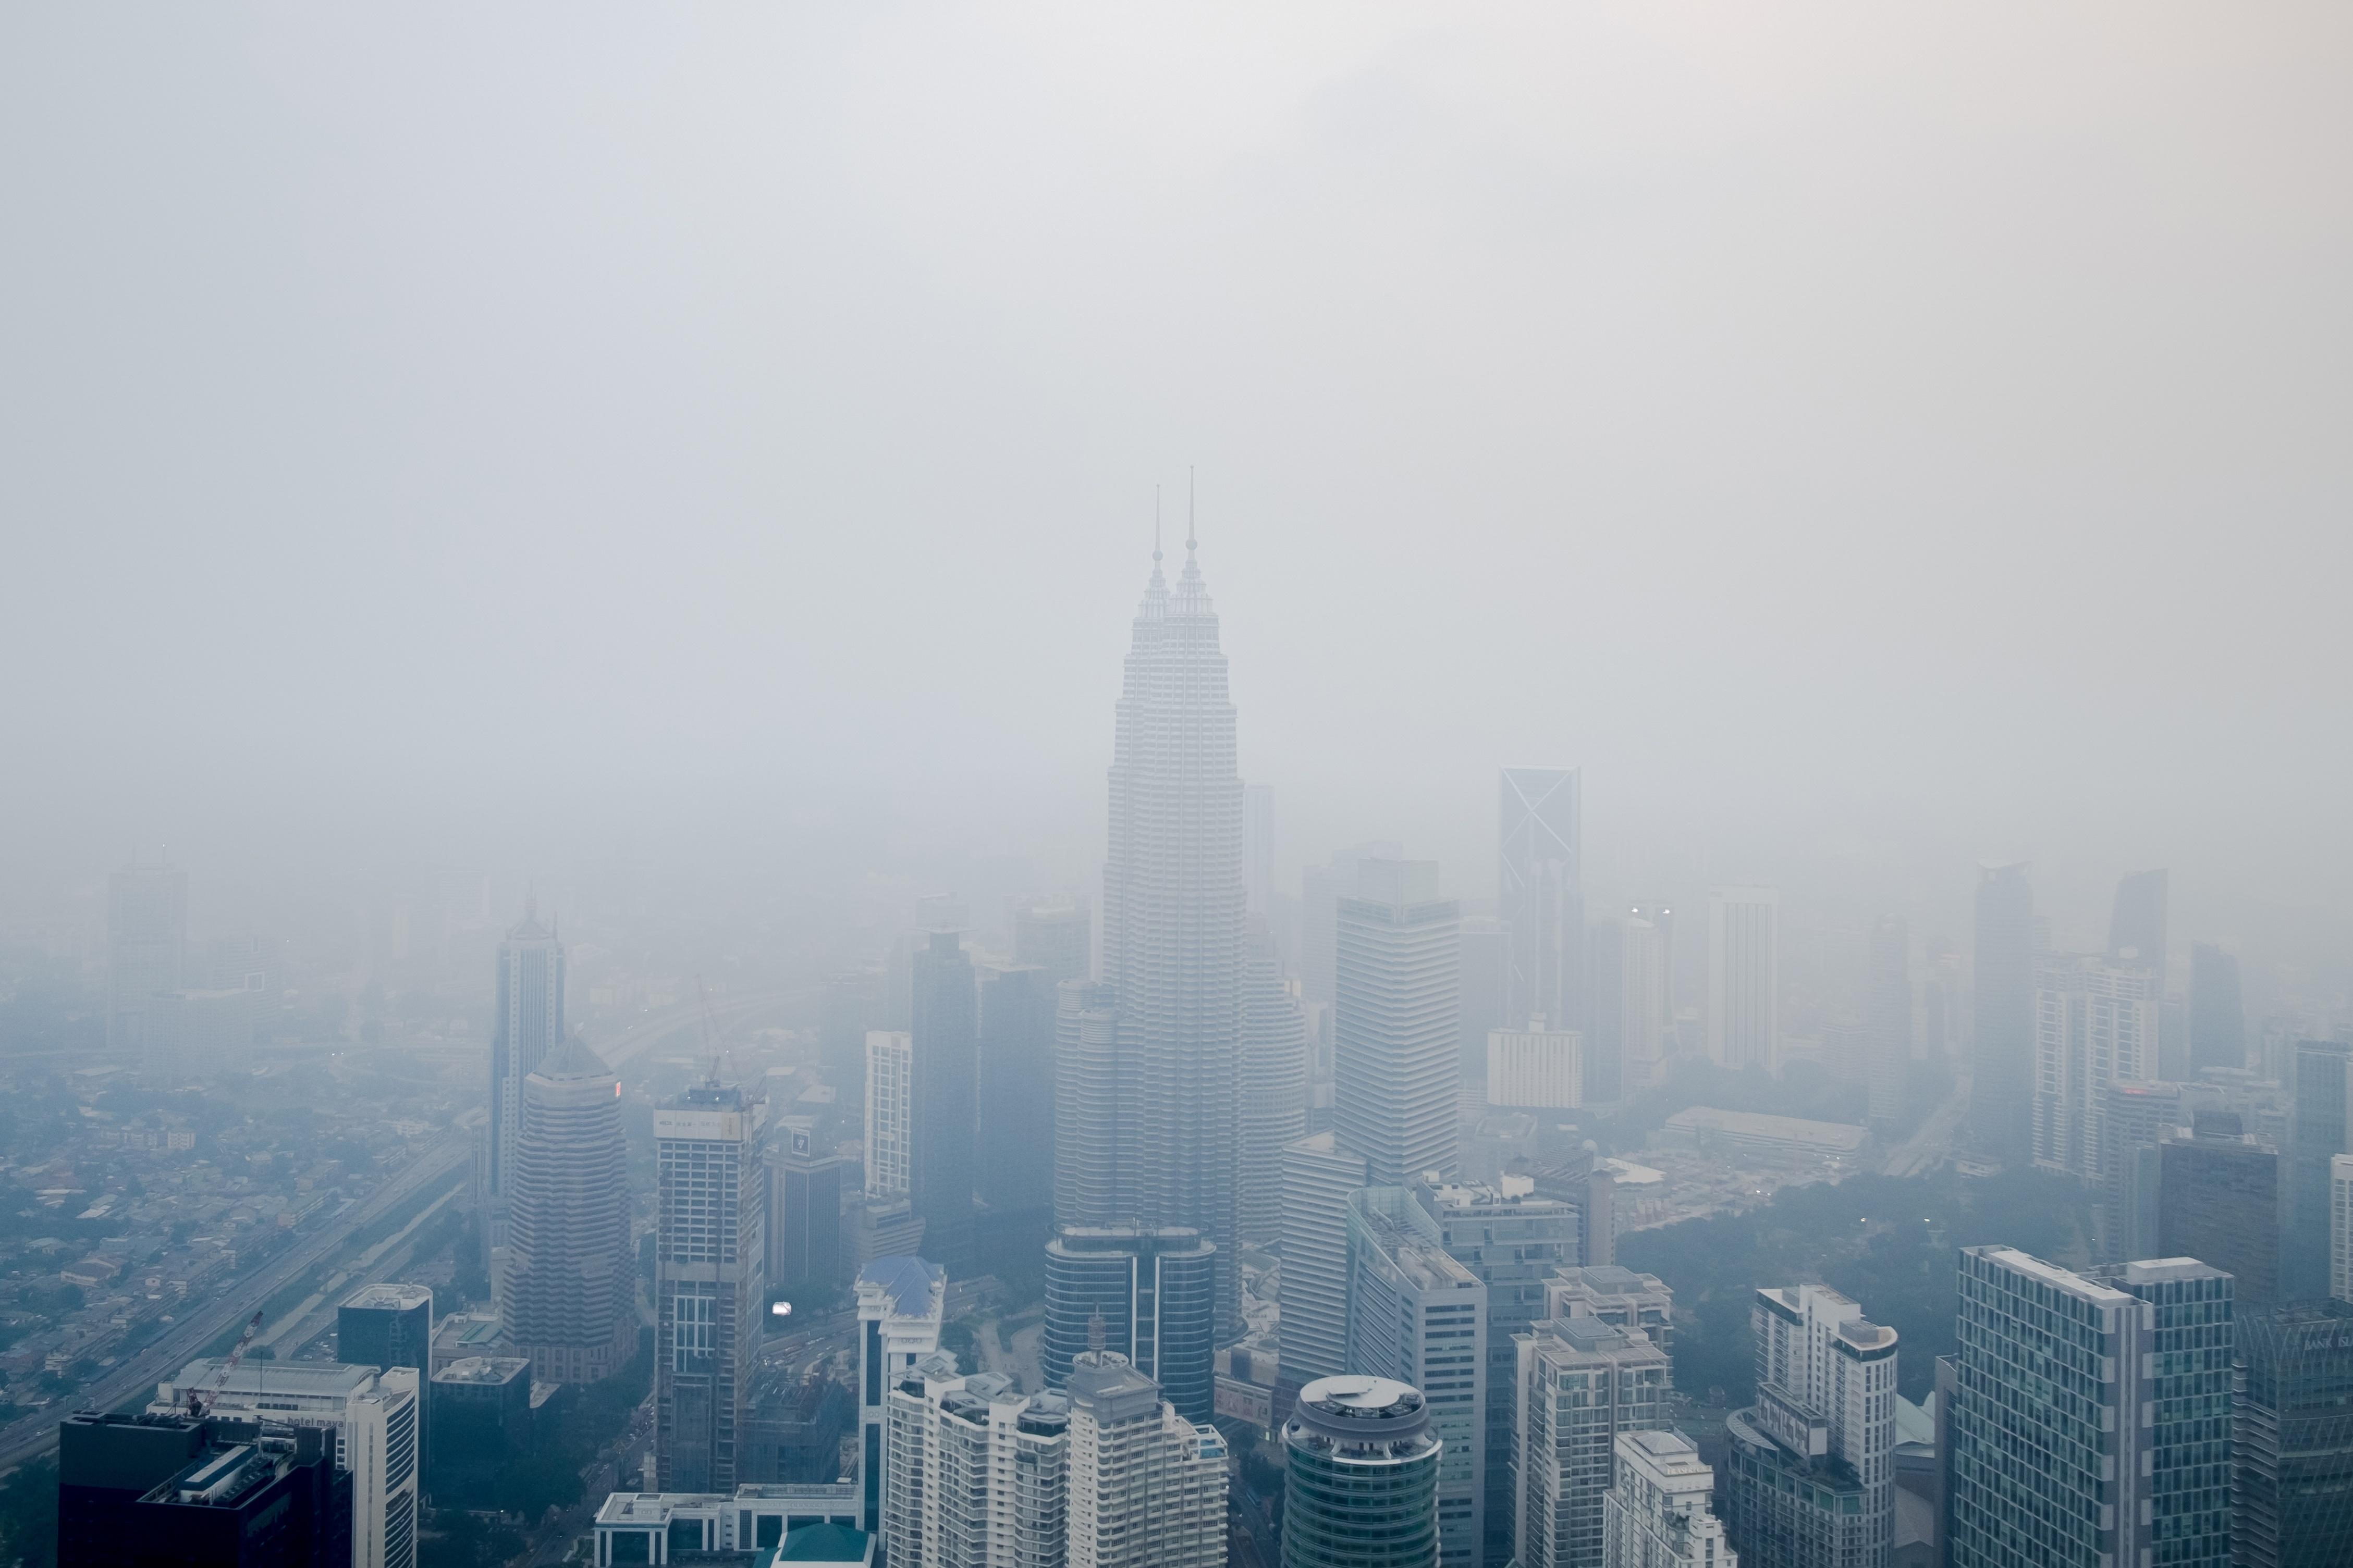 Картинка город с туманом